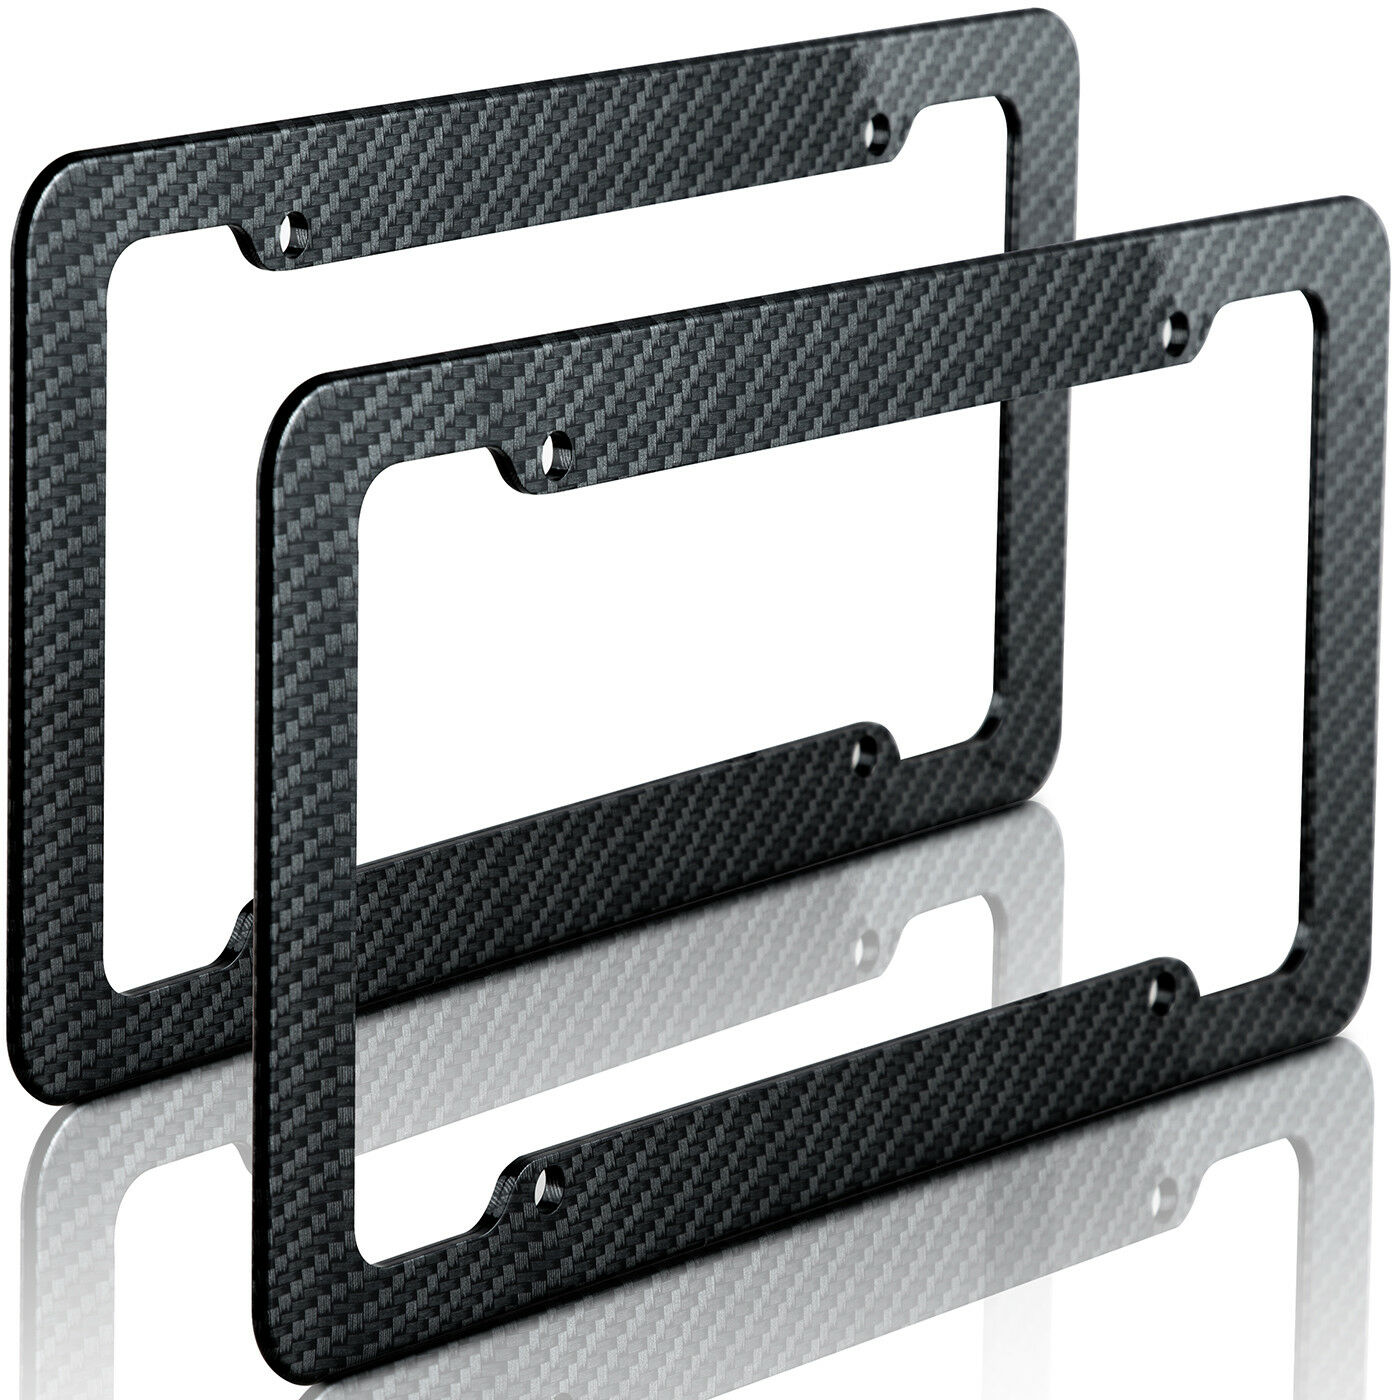 Car Parts - Plastic Carbon Fiber Style License Plate Frames For Front & Rear Bracket 2pc Set